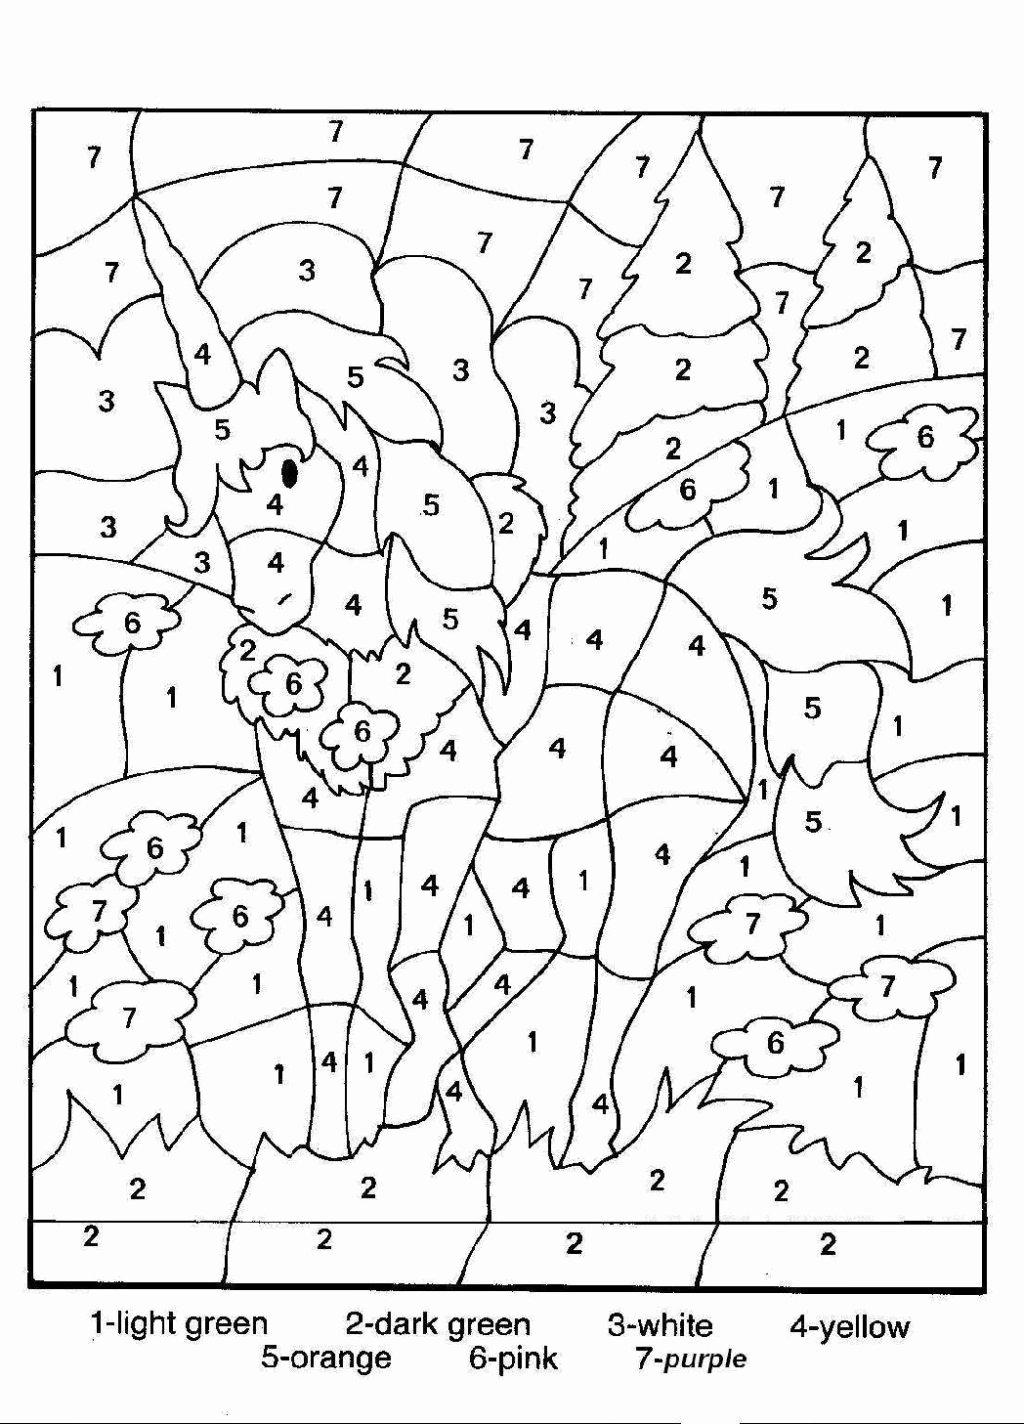 Multiplication Coloring Worksheets Grade 3 Kids Worksheet Multiplication Coloring Worksheets Puzzles Free